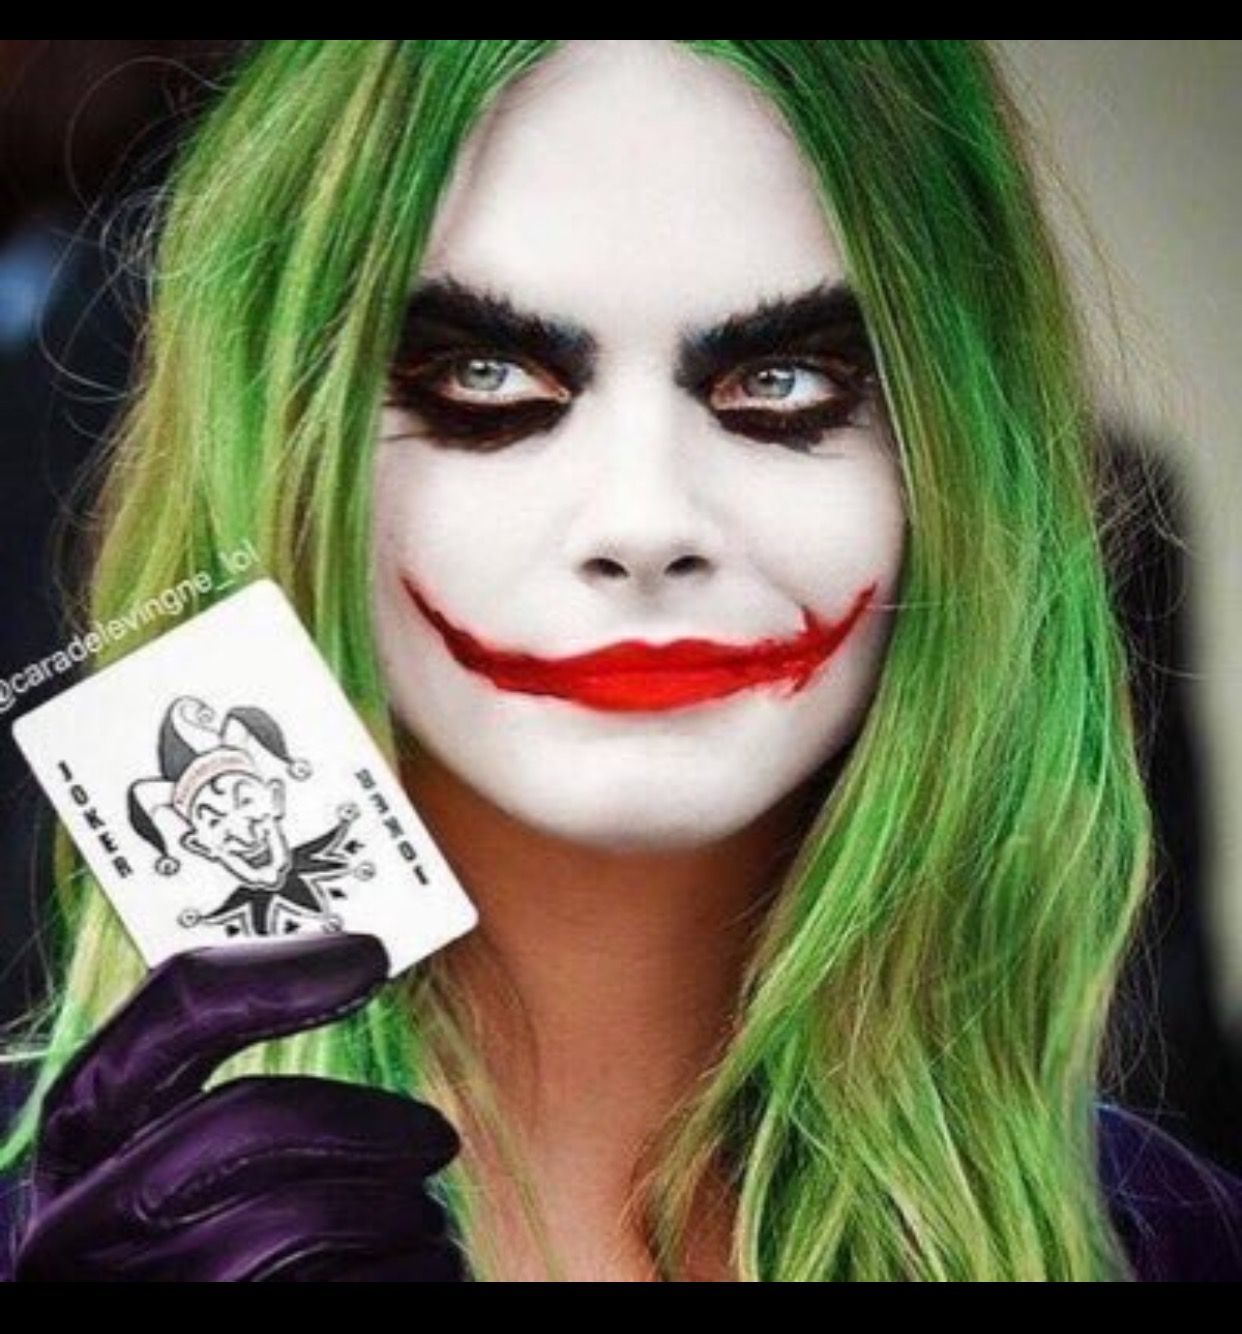 Halloween Makeup Joker | Halloween | Pinterest | Halloween Makeup Joker And Makeup